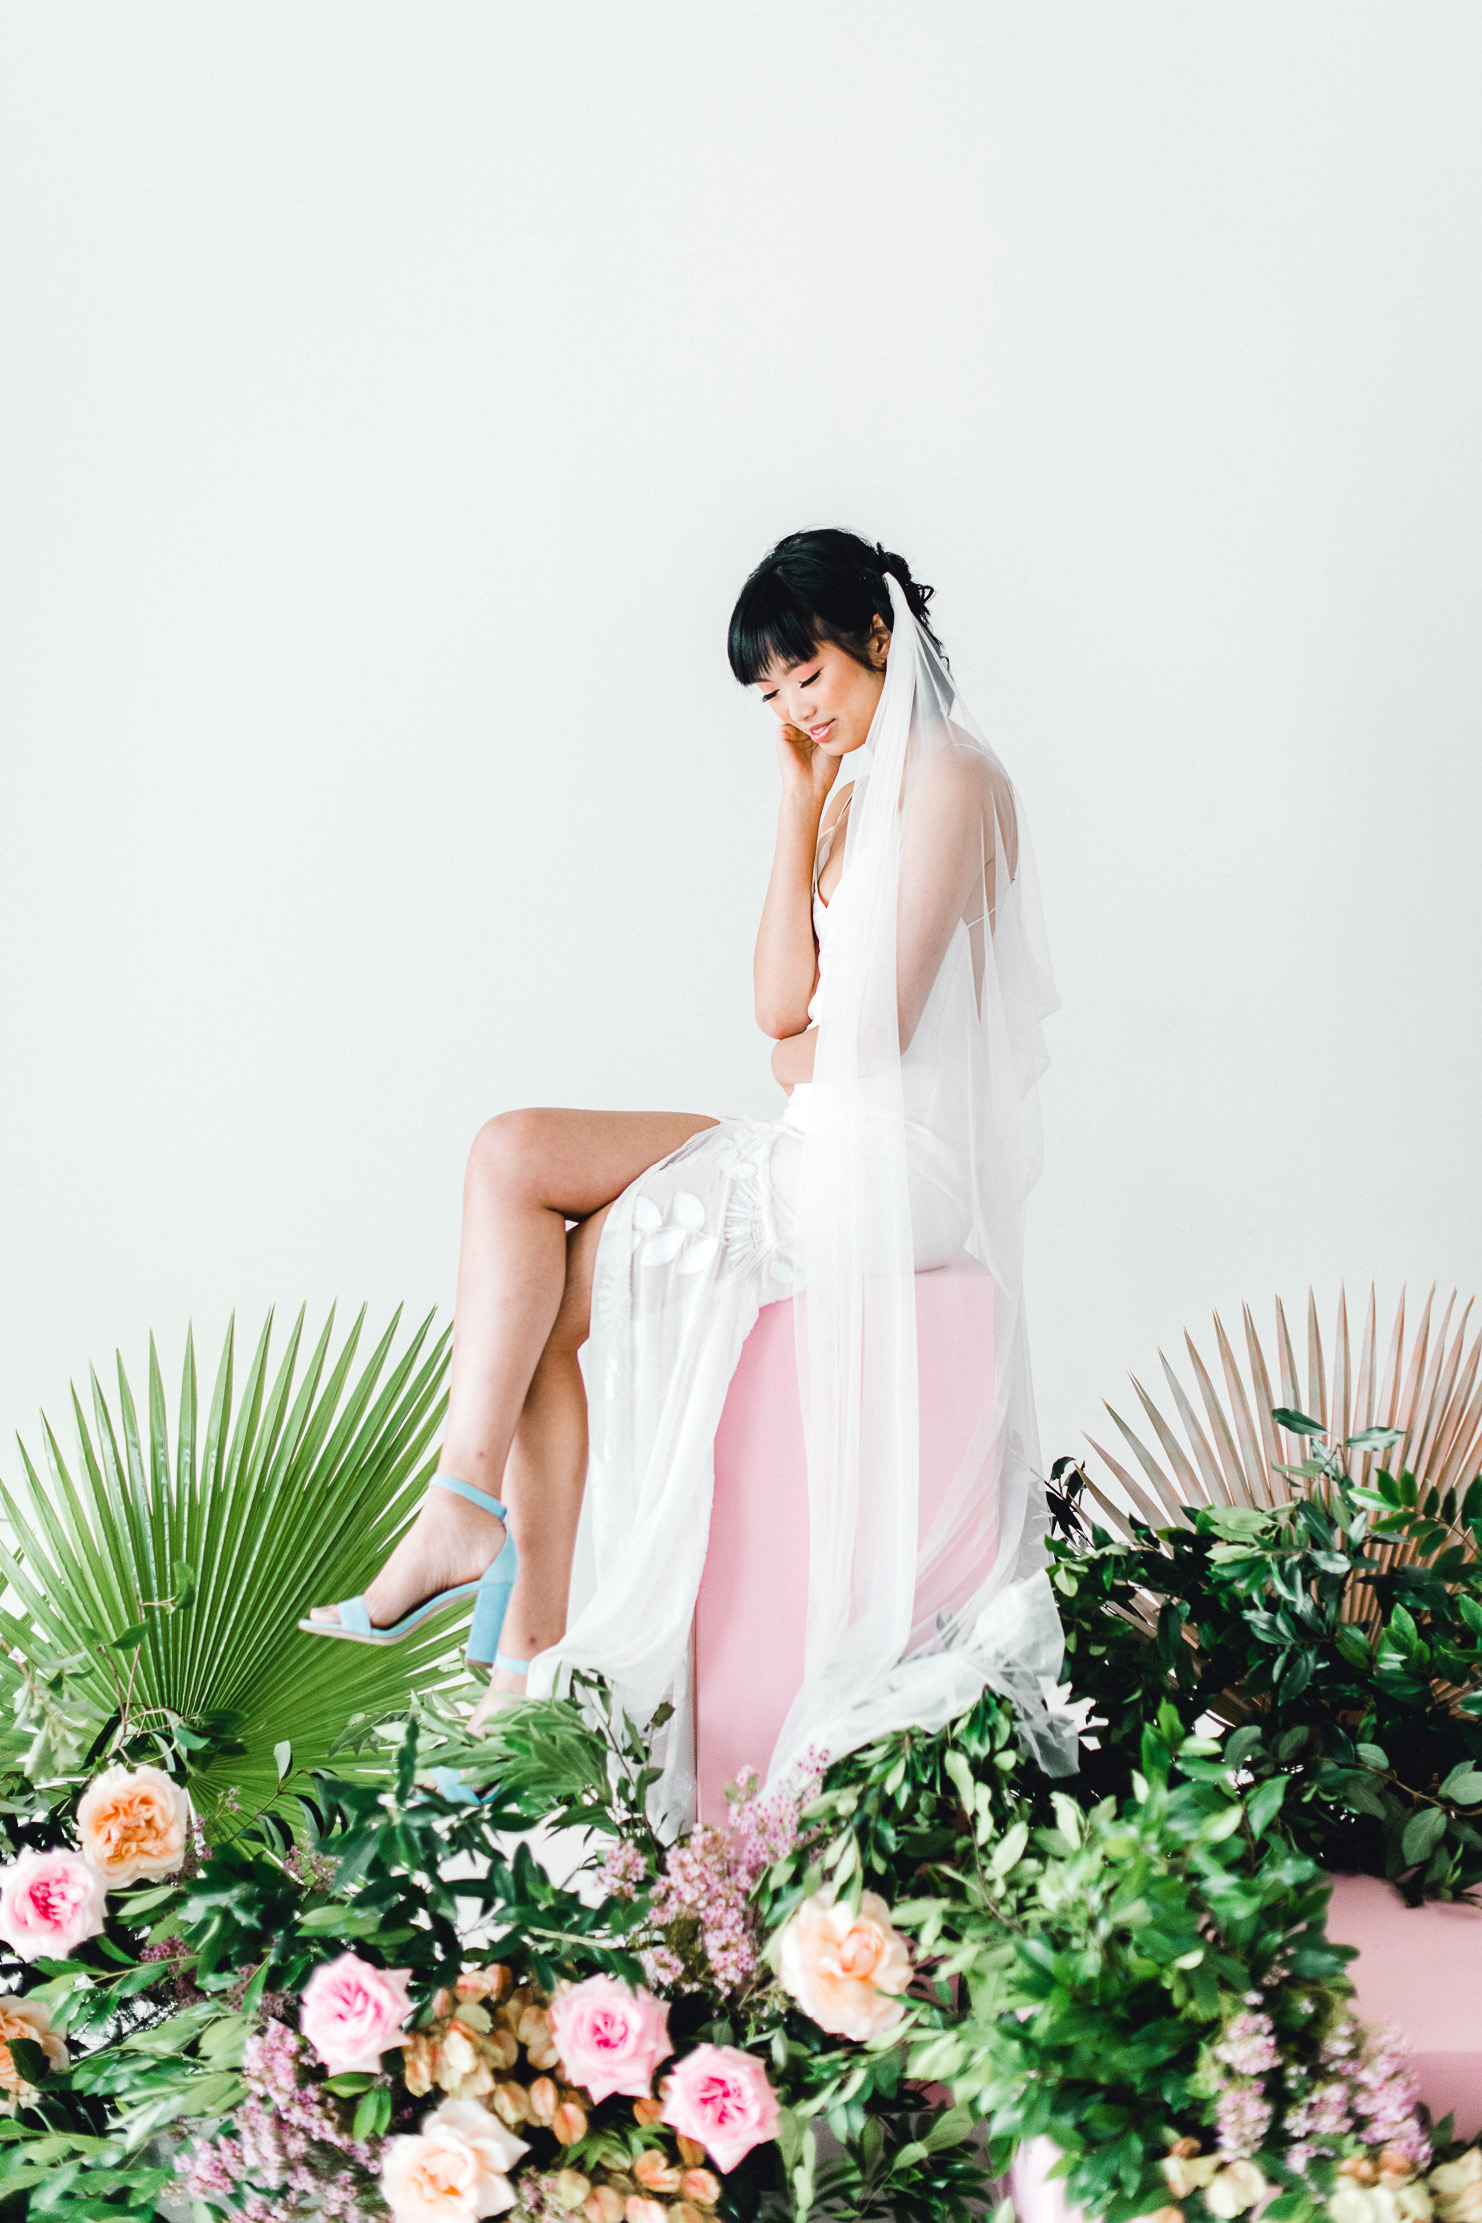 Houston-Wedding-Photographer-Editorial-Fine-Art-Film-Destination-Dallas-Texas-Mibellarosa-Josh-Dana-Fernandez-Photography-219.jpg